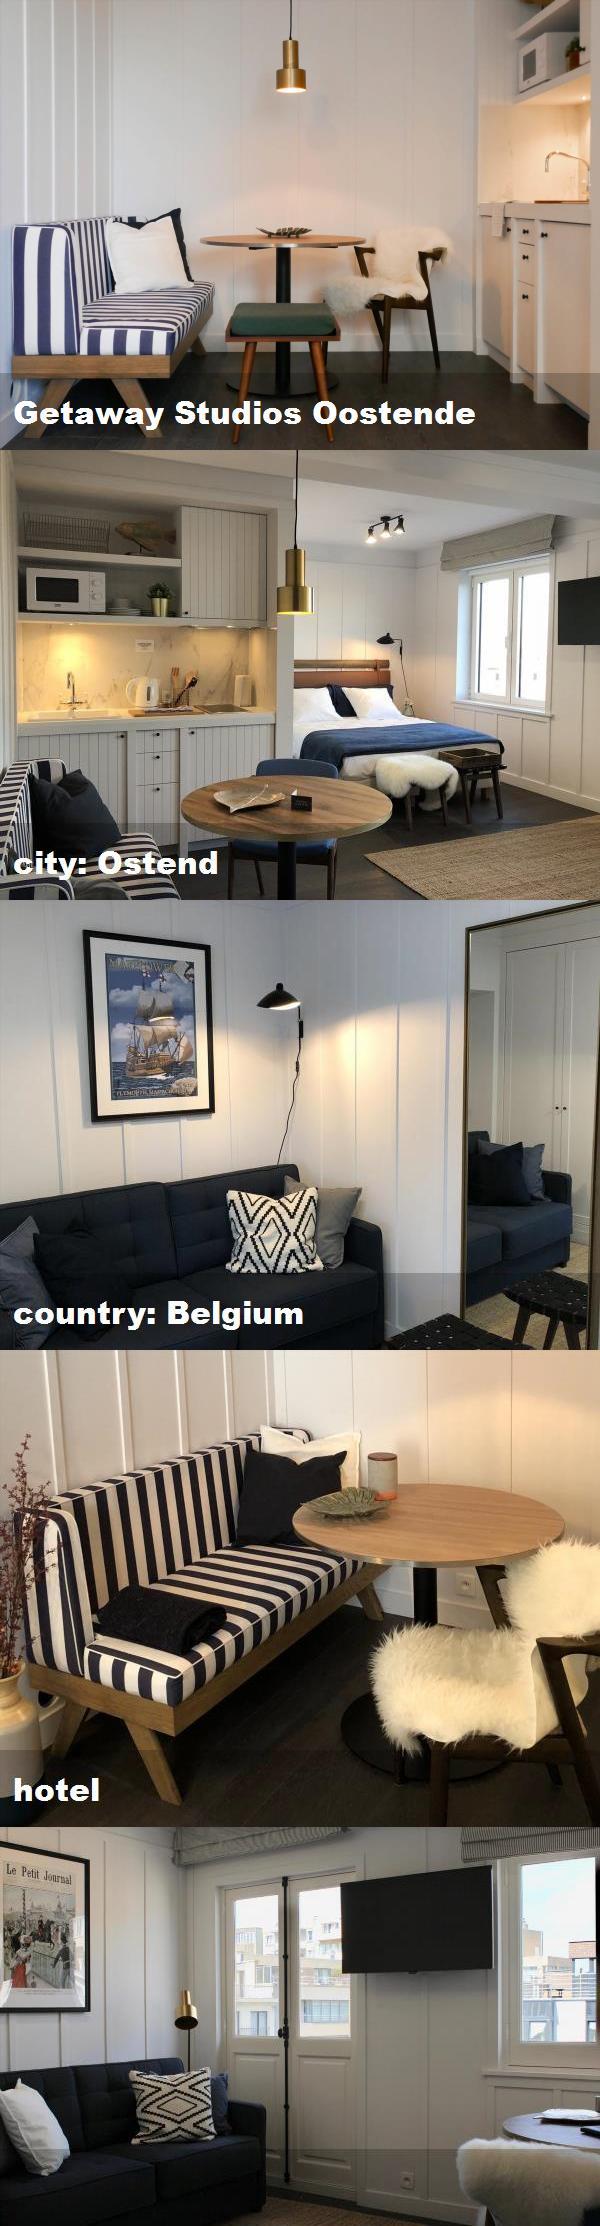 Getaway Studios Oostende City Ostend Country Belgium Hotel Belgium Hotels Ostend Hotel